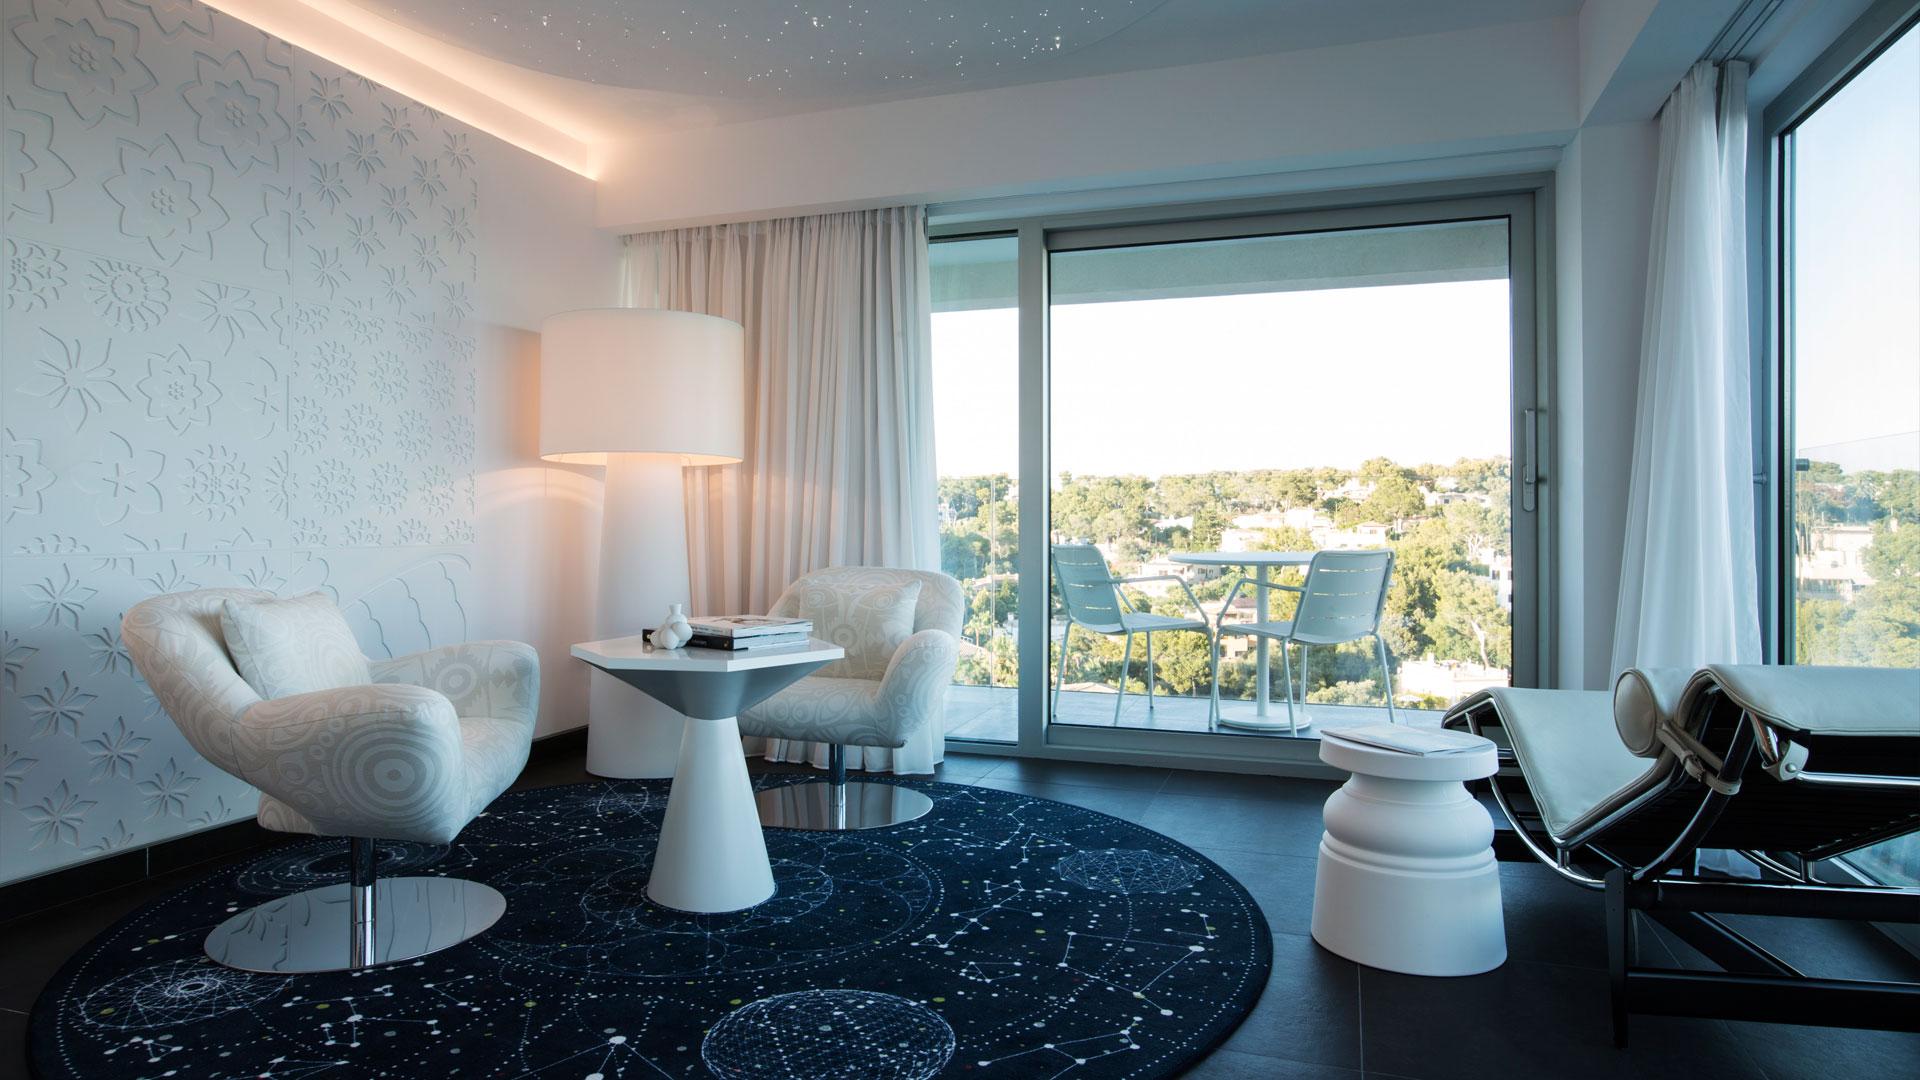 ITALICA PLACAS RELIEVE HOTEL MARCEL WANDERS EN MALLORCA